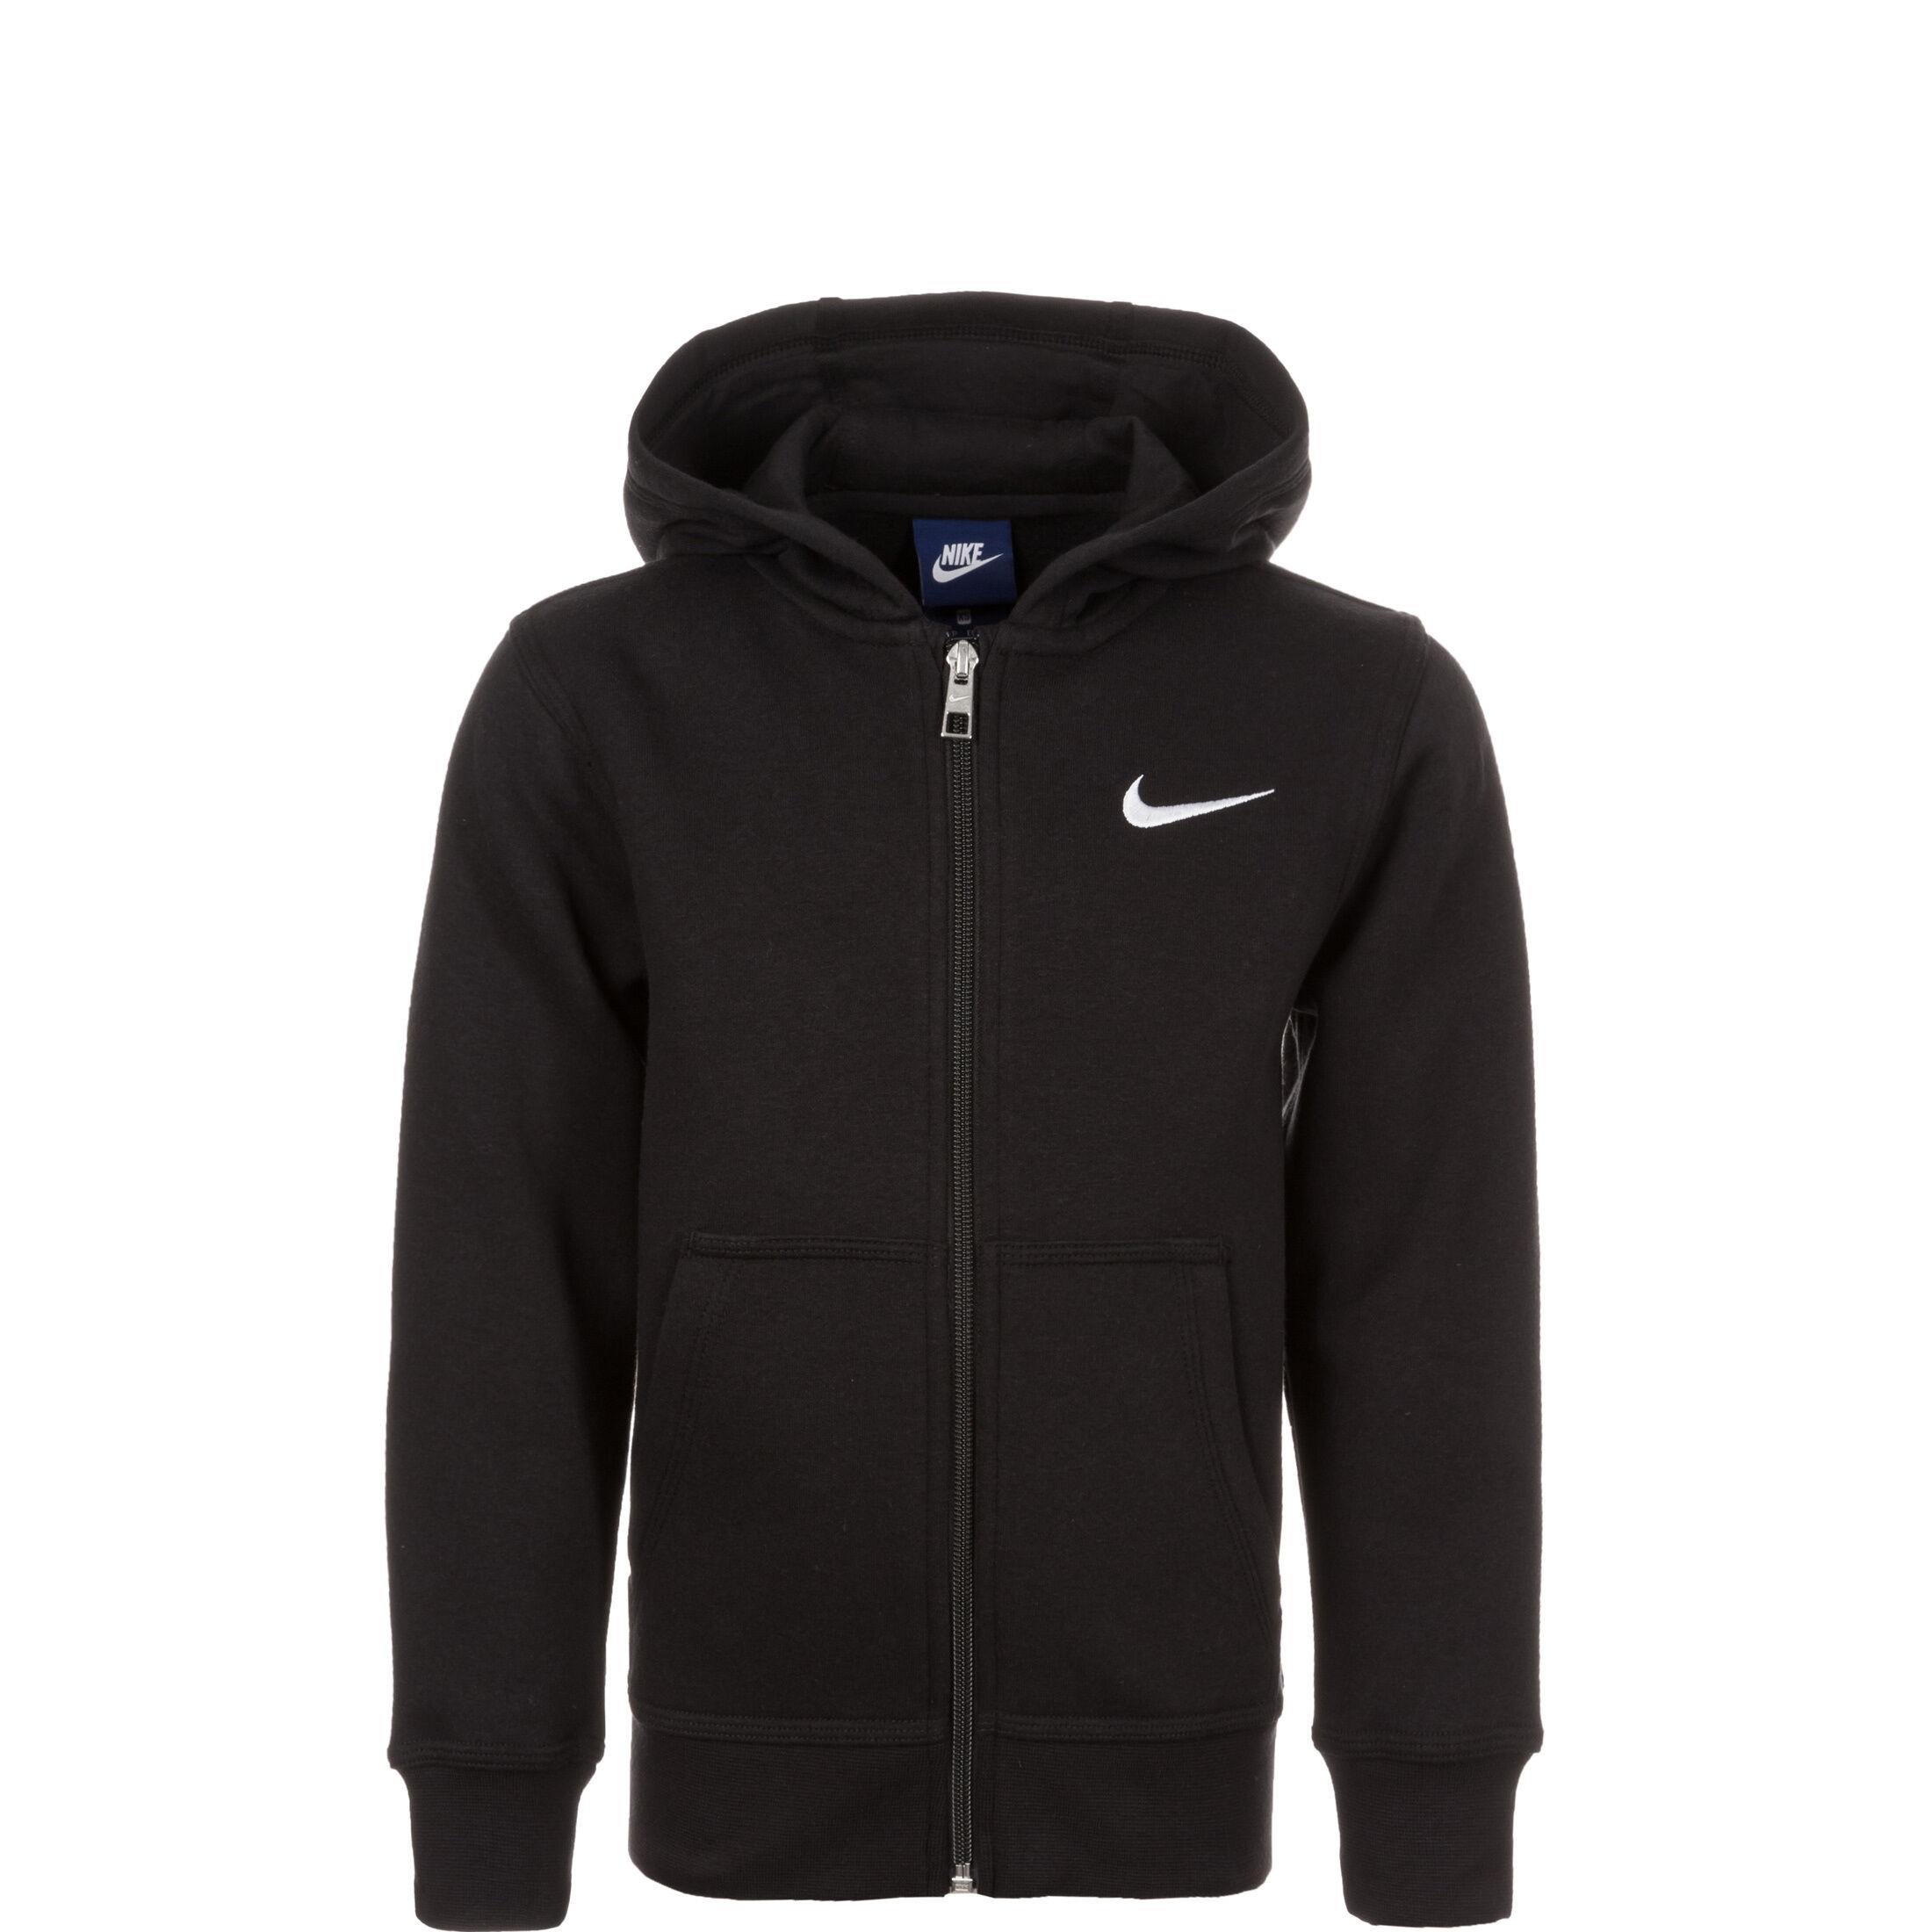 Nike Hoodie FZ YA76 Fleece GrauWeiß Kinder